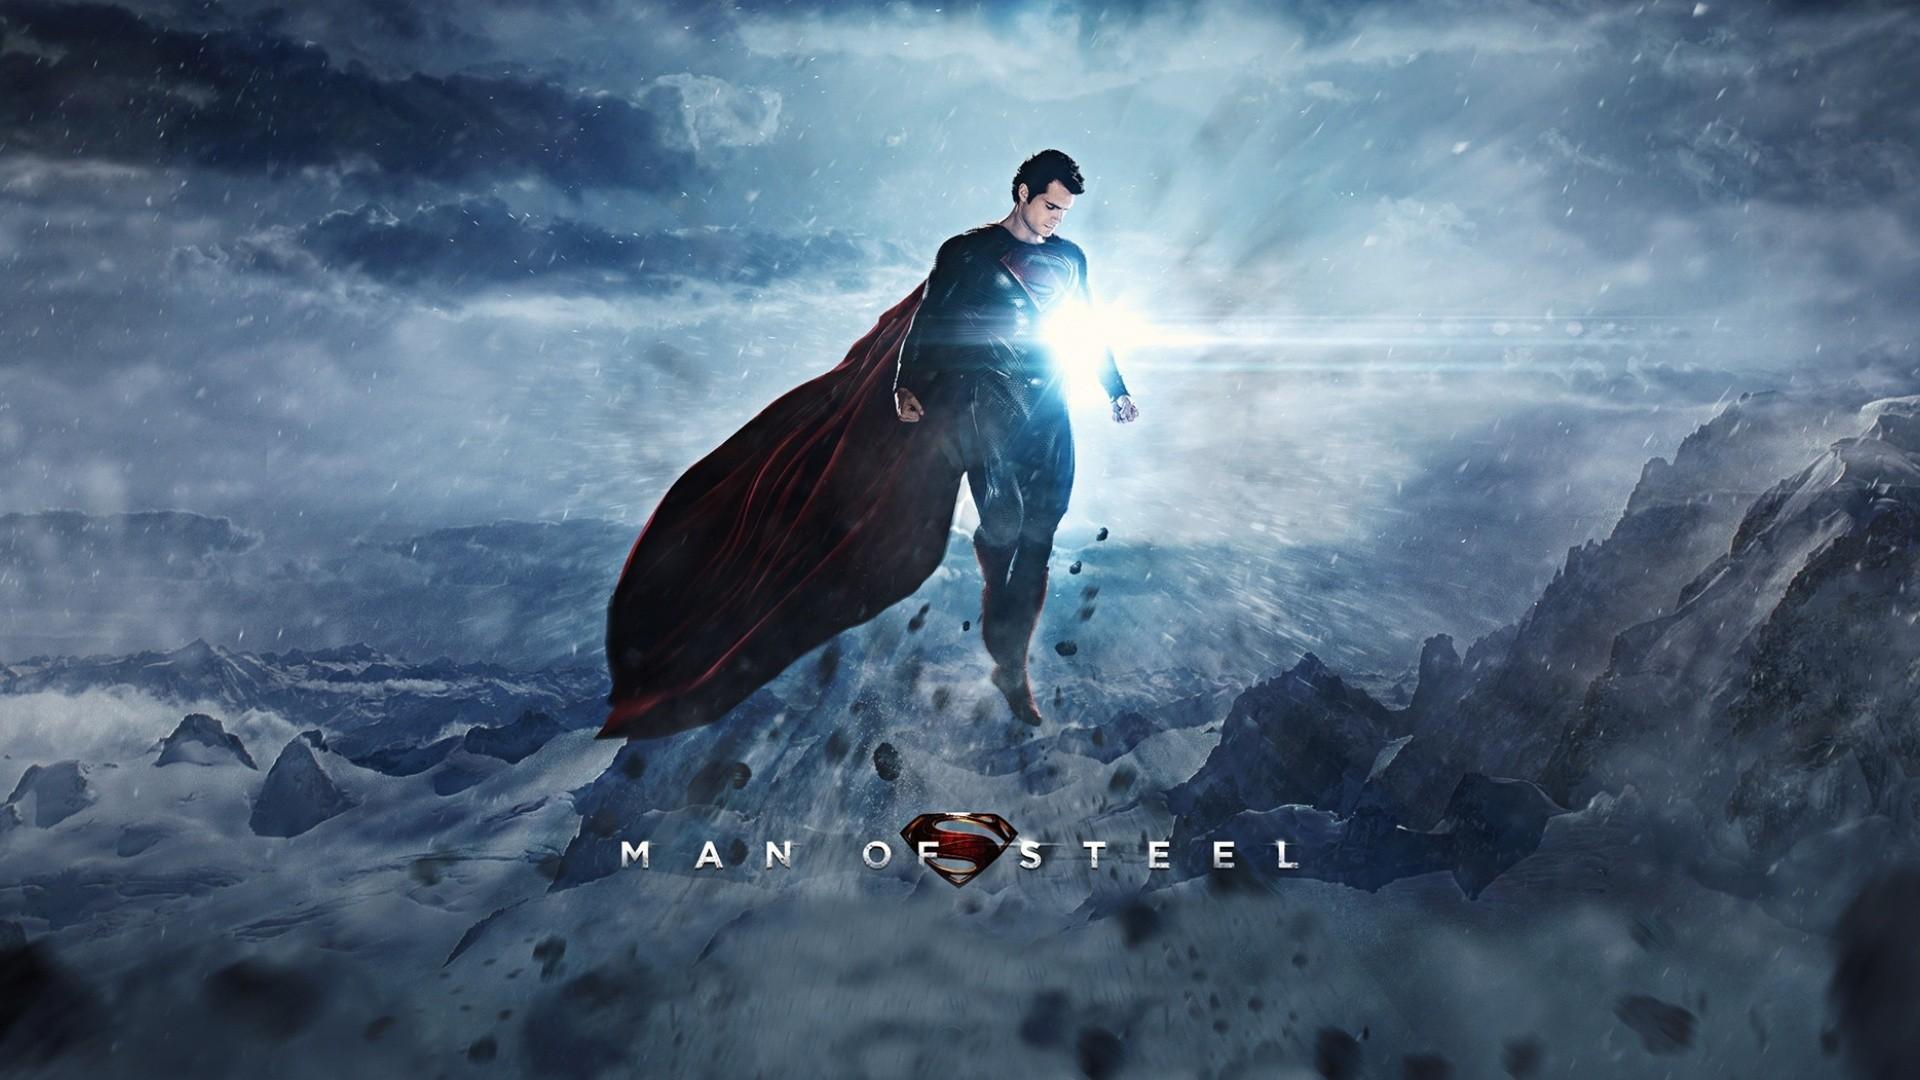 14 best Superman images on Pinterest   Superheroes, Super man and Superman  stuff